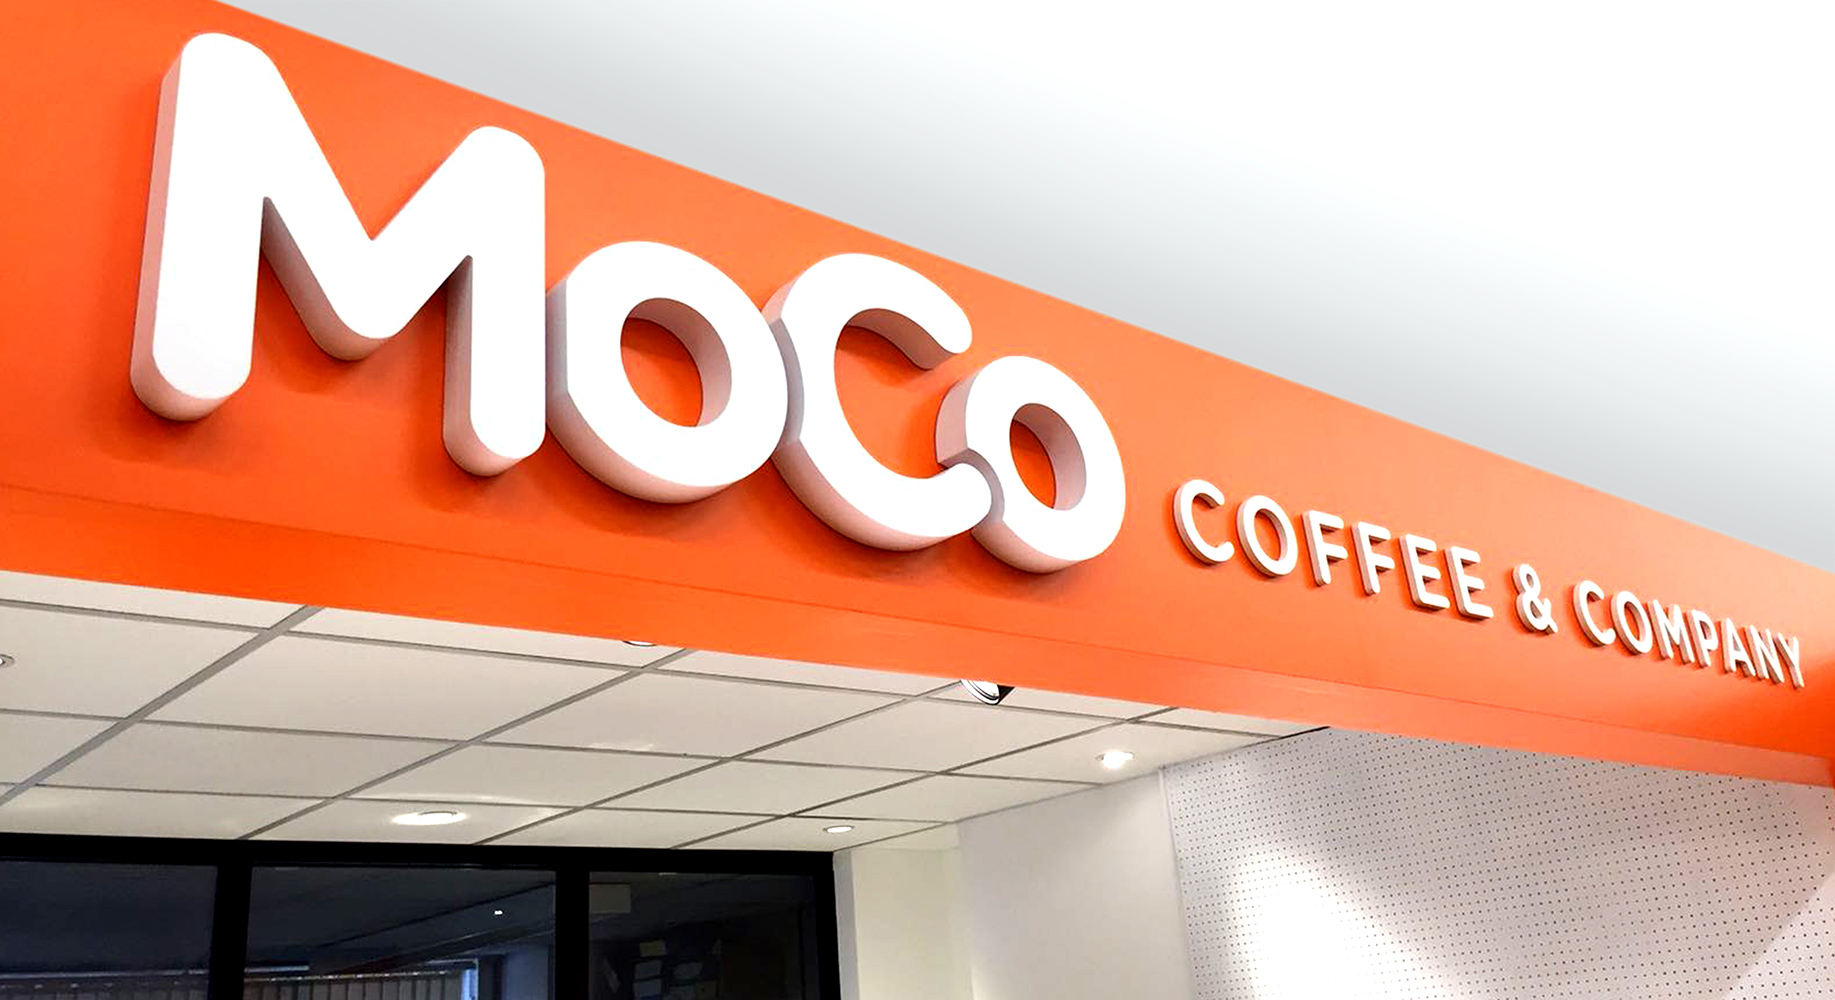 MoCo Coffee & Company kiosk